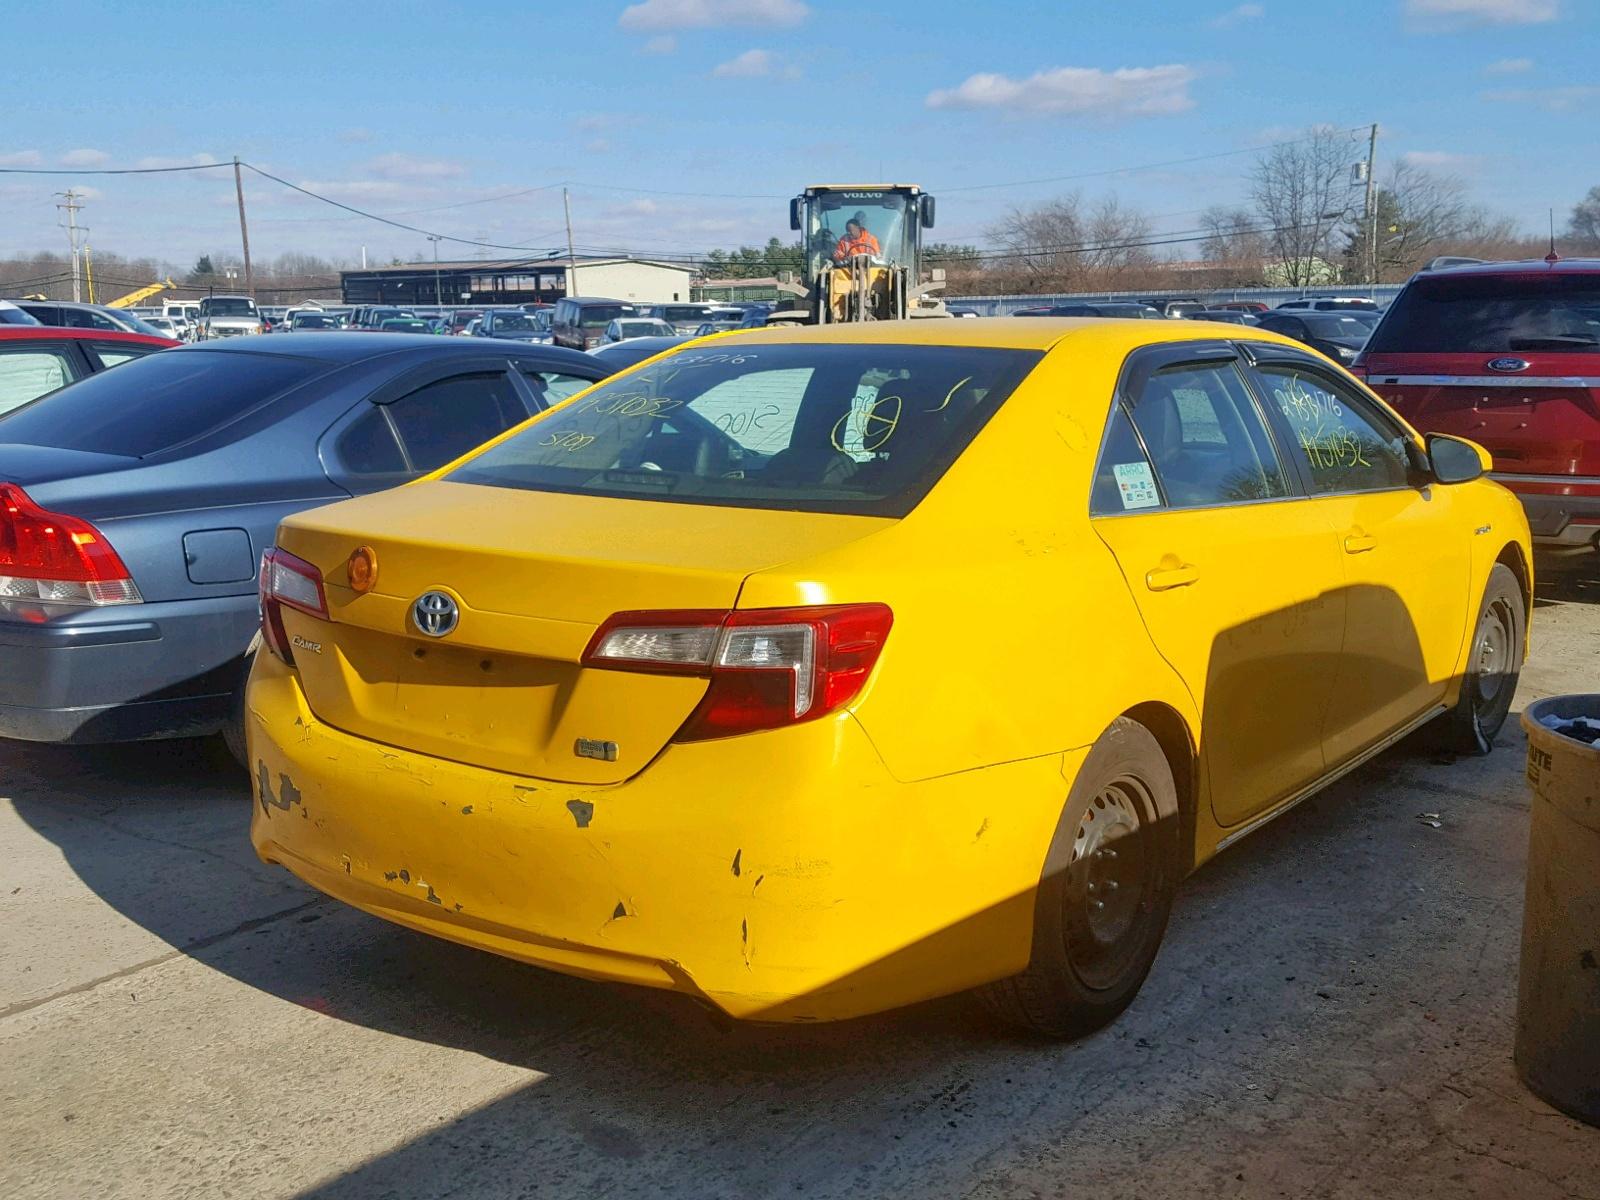 2012 Toyota Camry Hybr 2.5L rear view